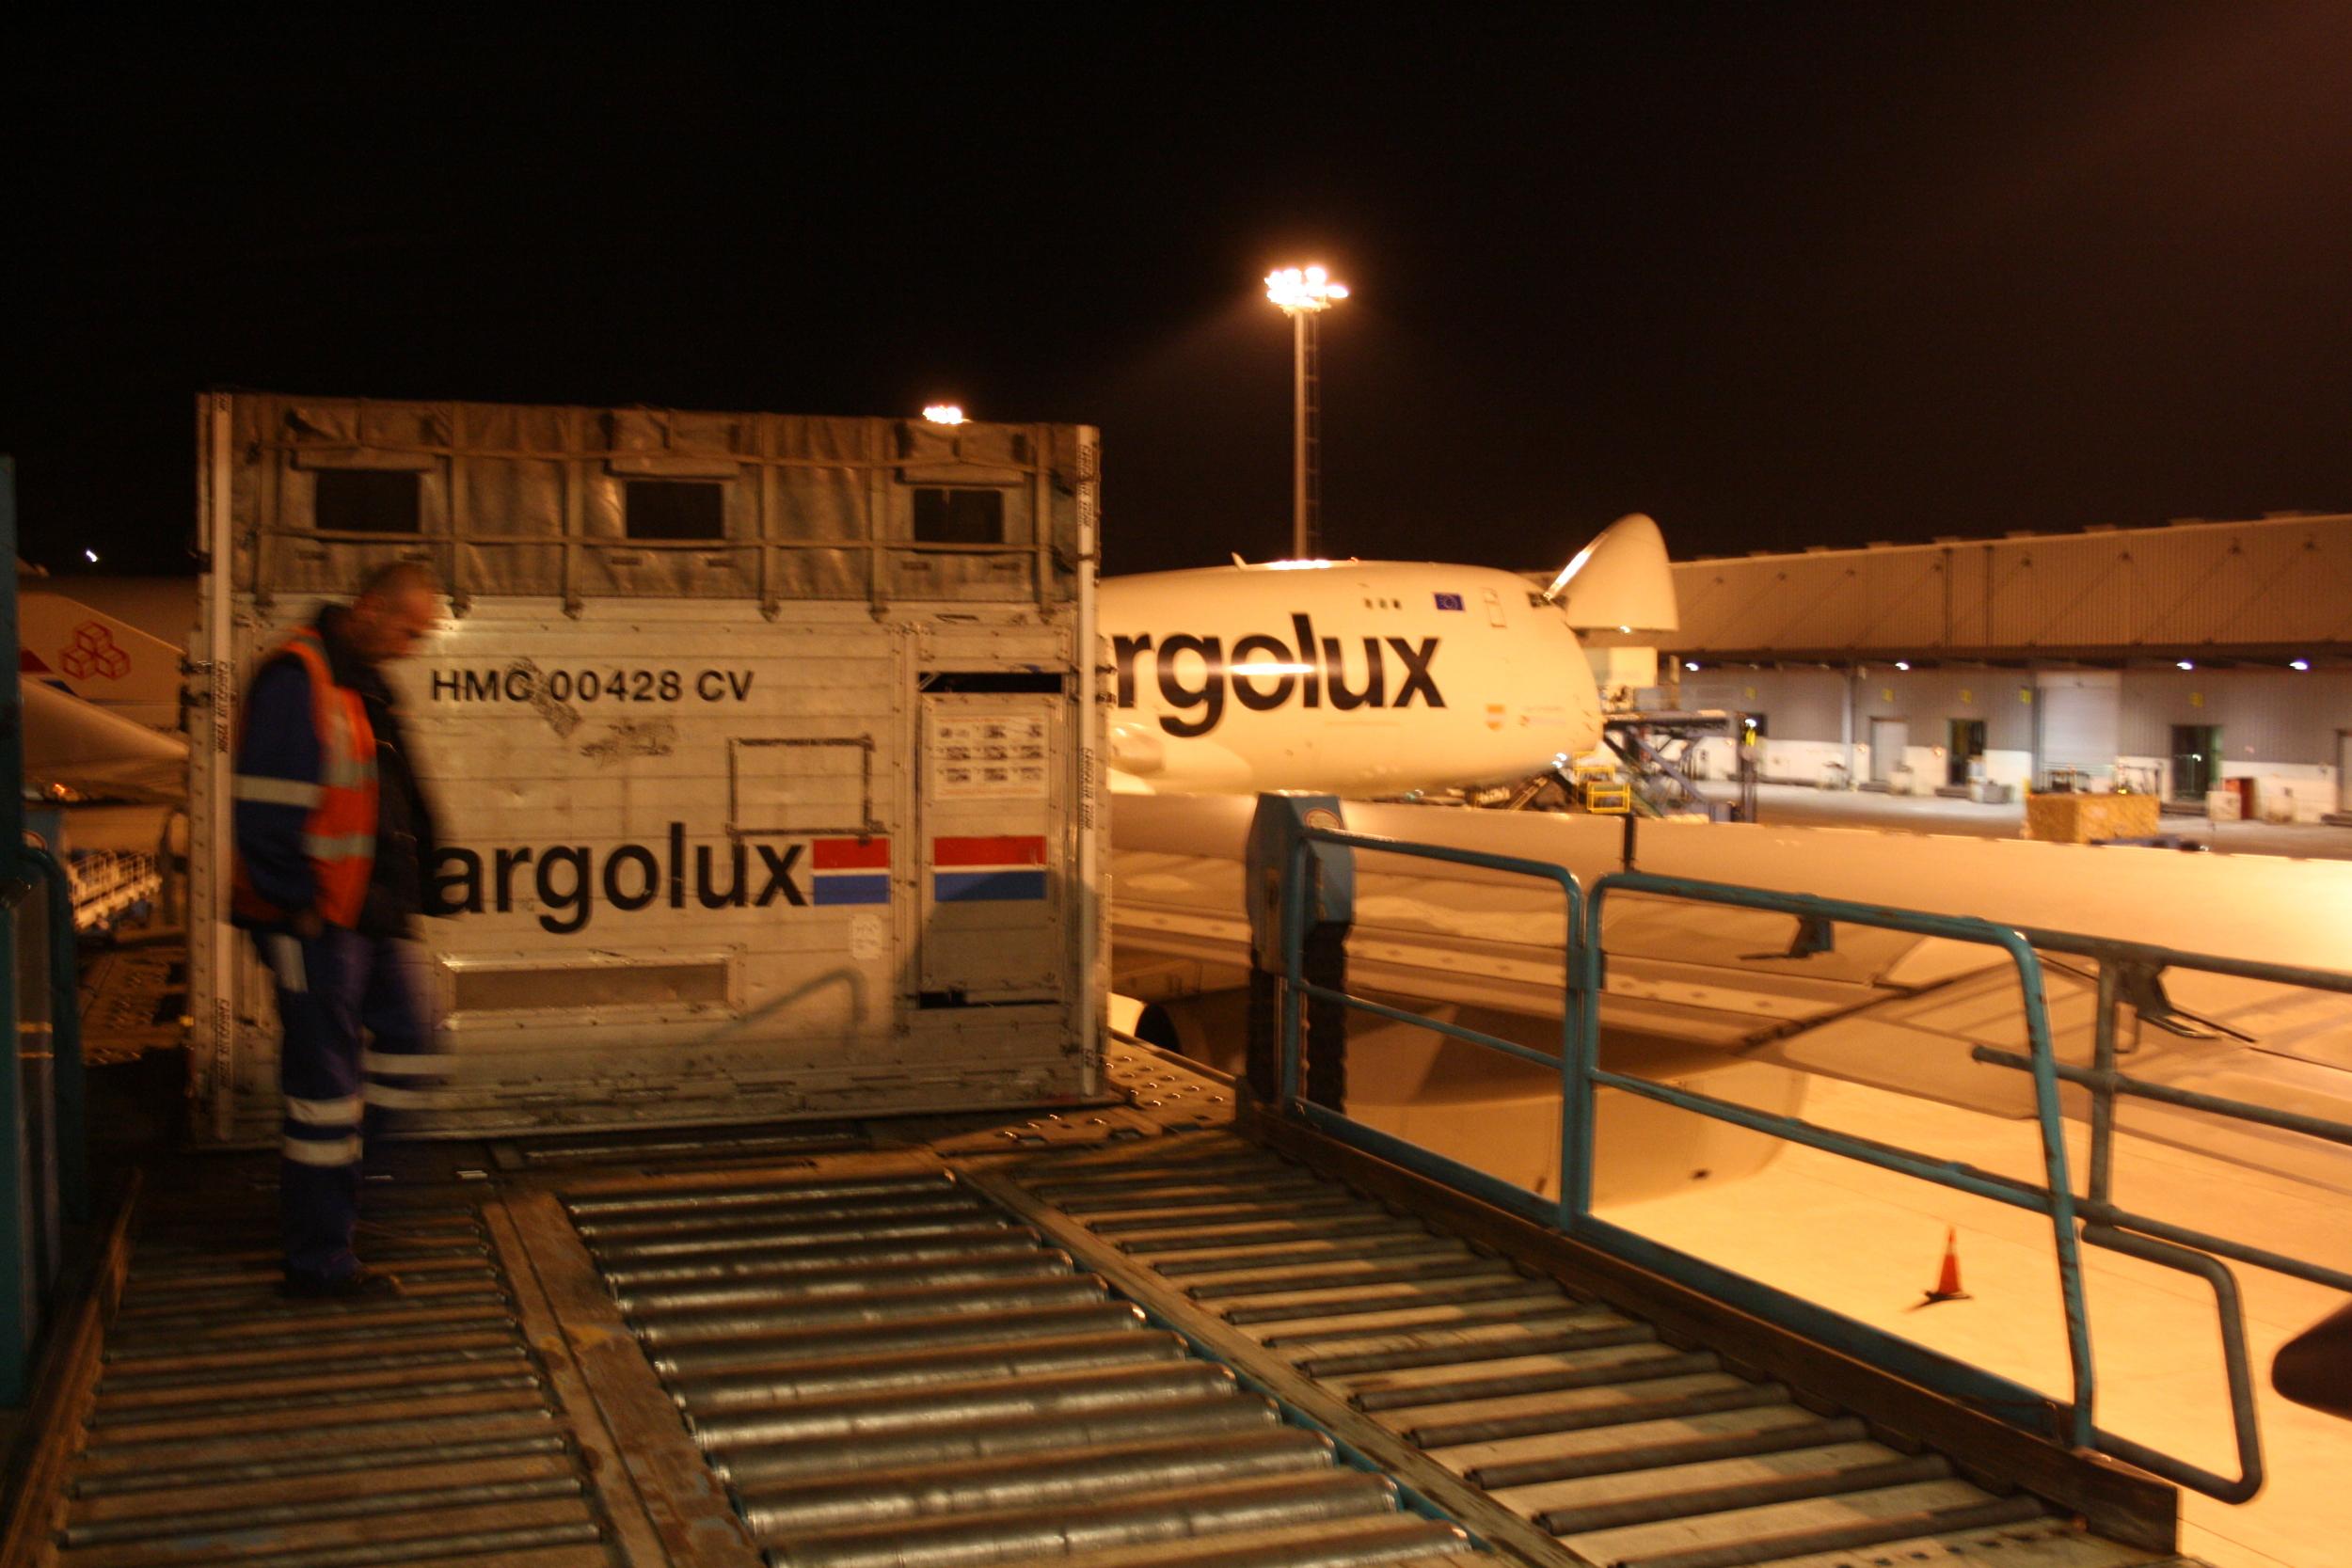 Bilder Cargolux 15.Oct09 050